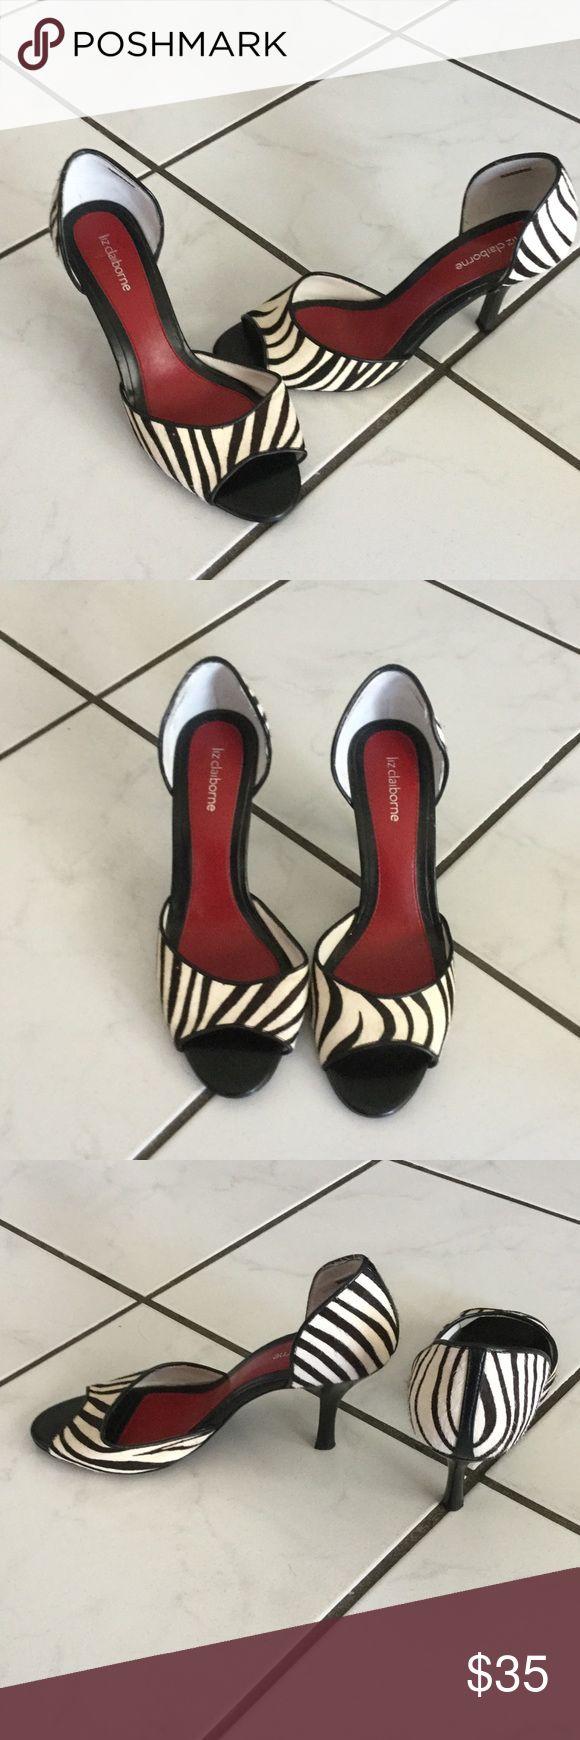 Liz Claiborne zebra print heels Liz Claiborne zebra hair print 2 inch heels brand new never worn Liz Claiborne Shoes Heels